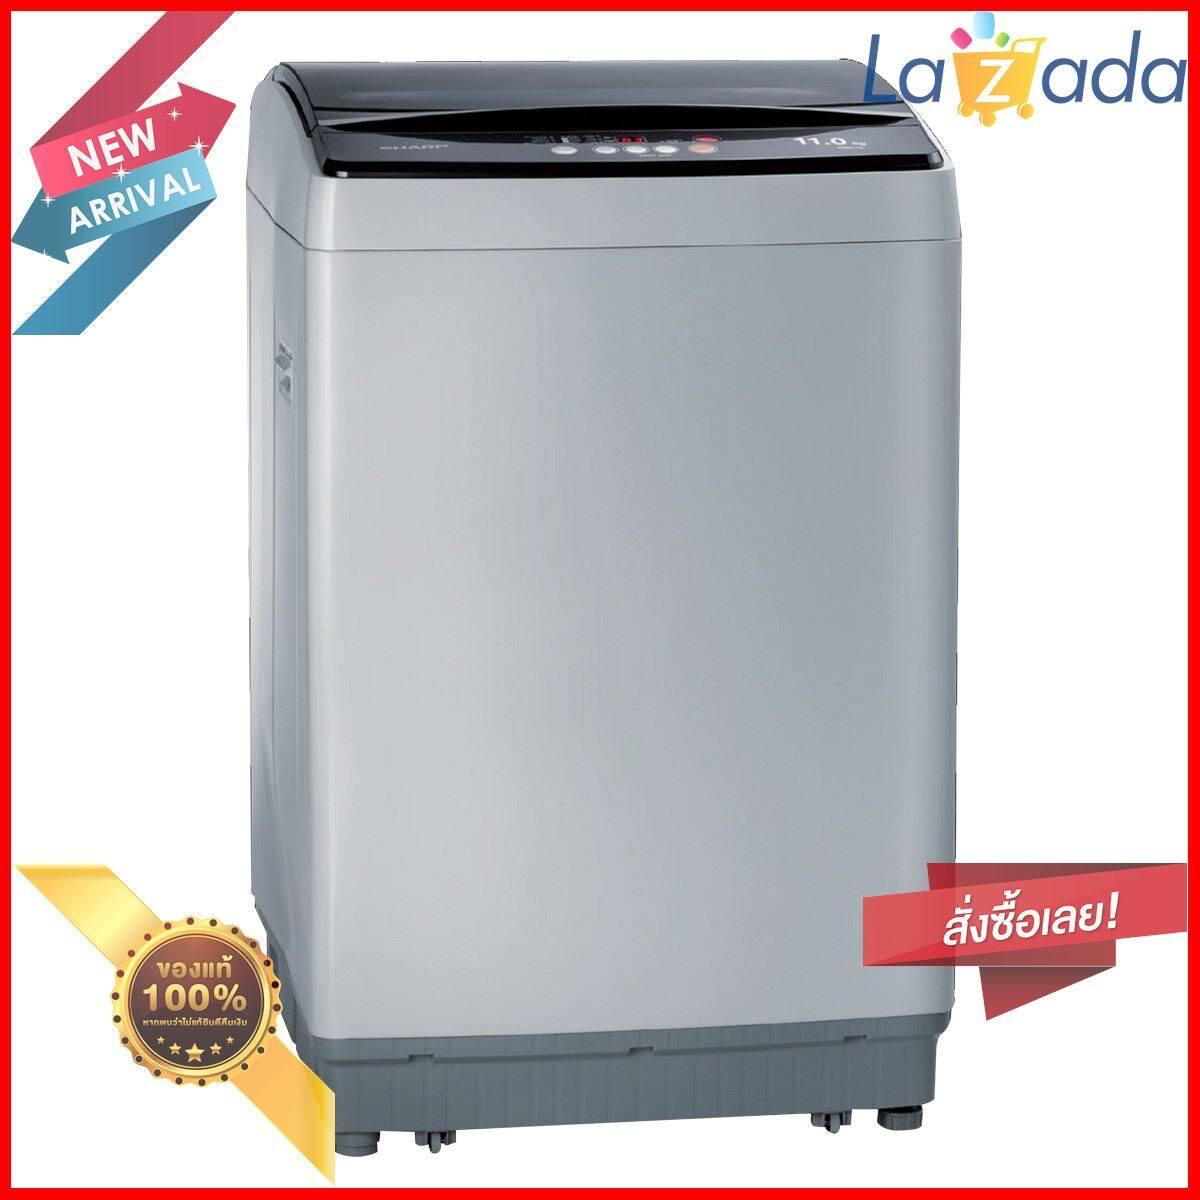 SHARP เครื่องซักผ้าฝาบน 11 กก. รุ่น ES-W119T-SL